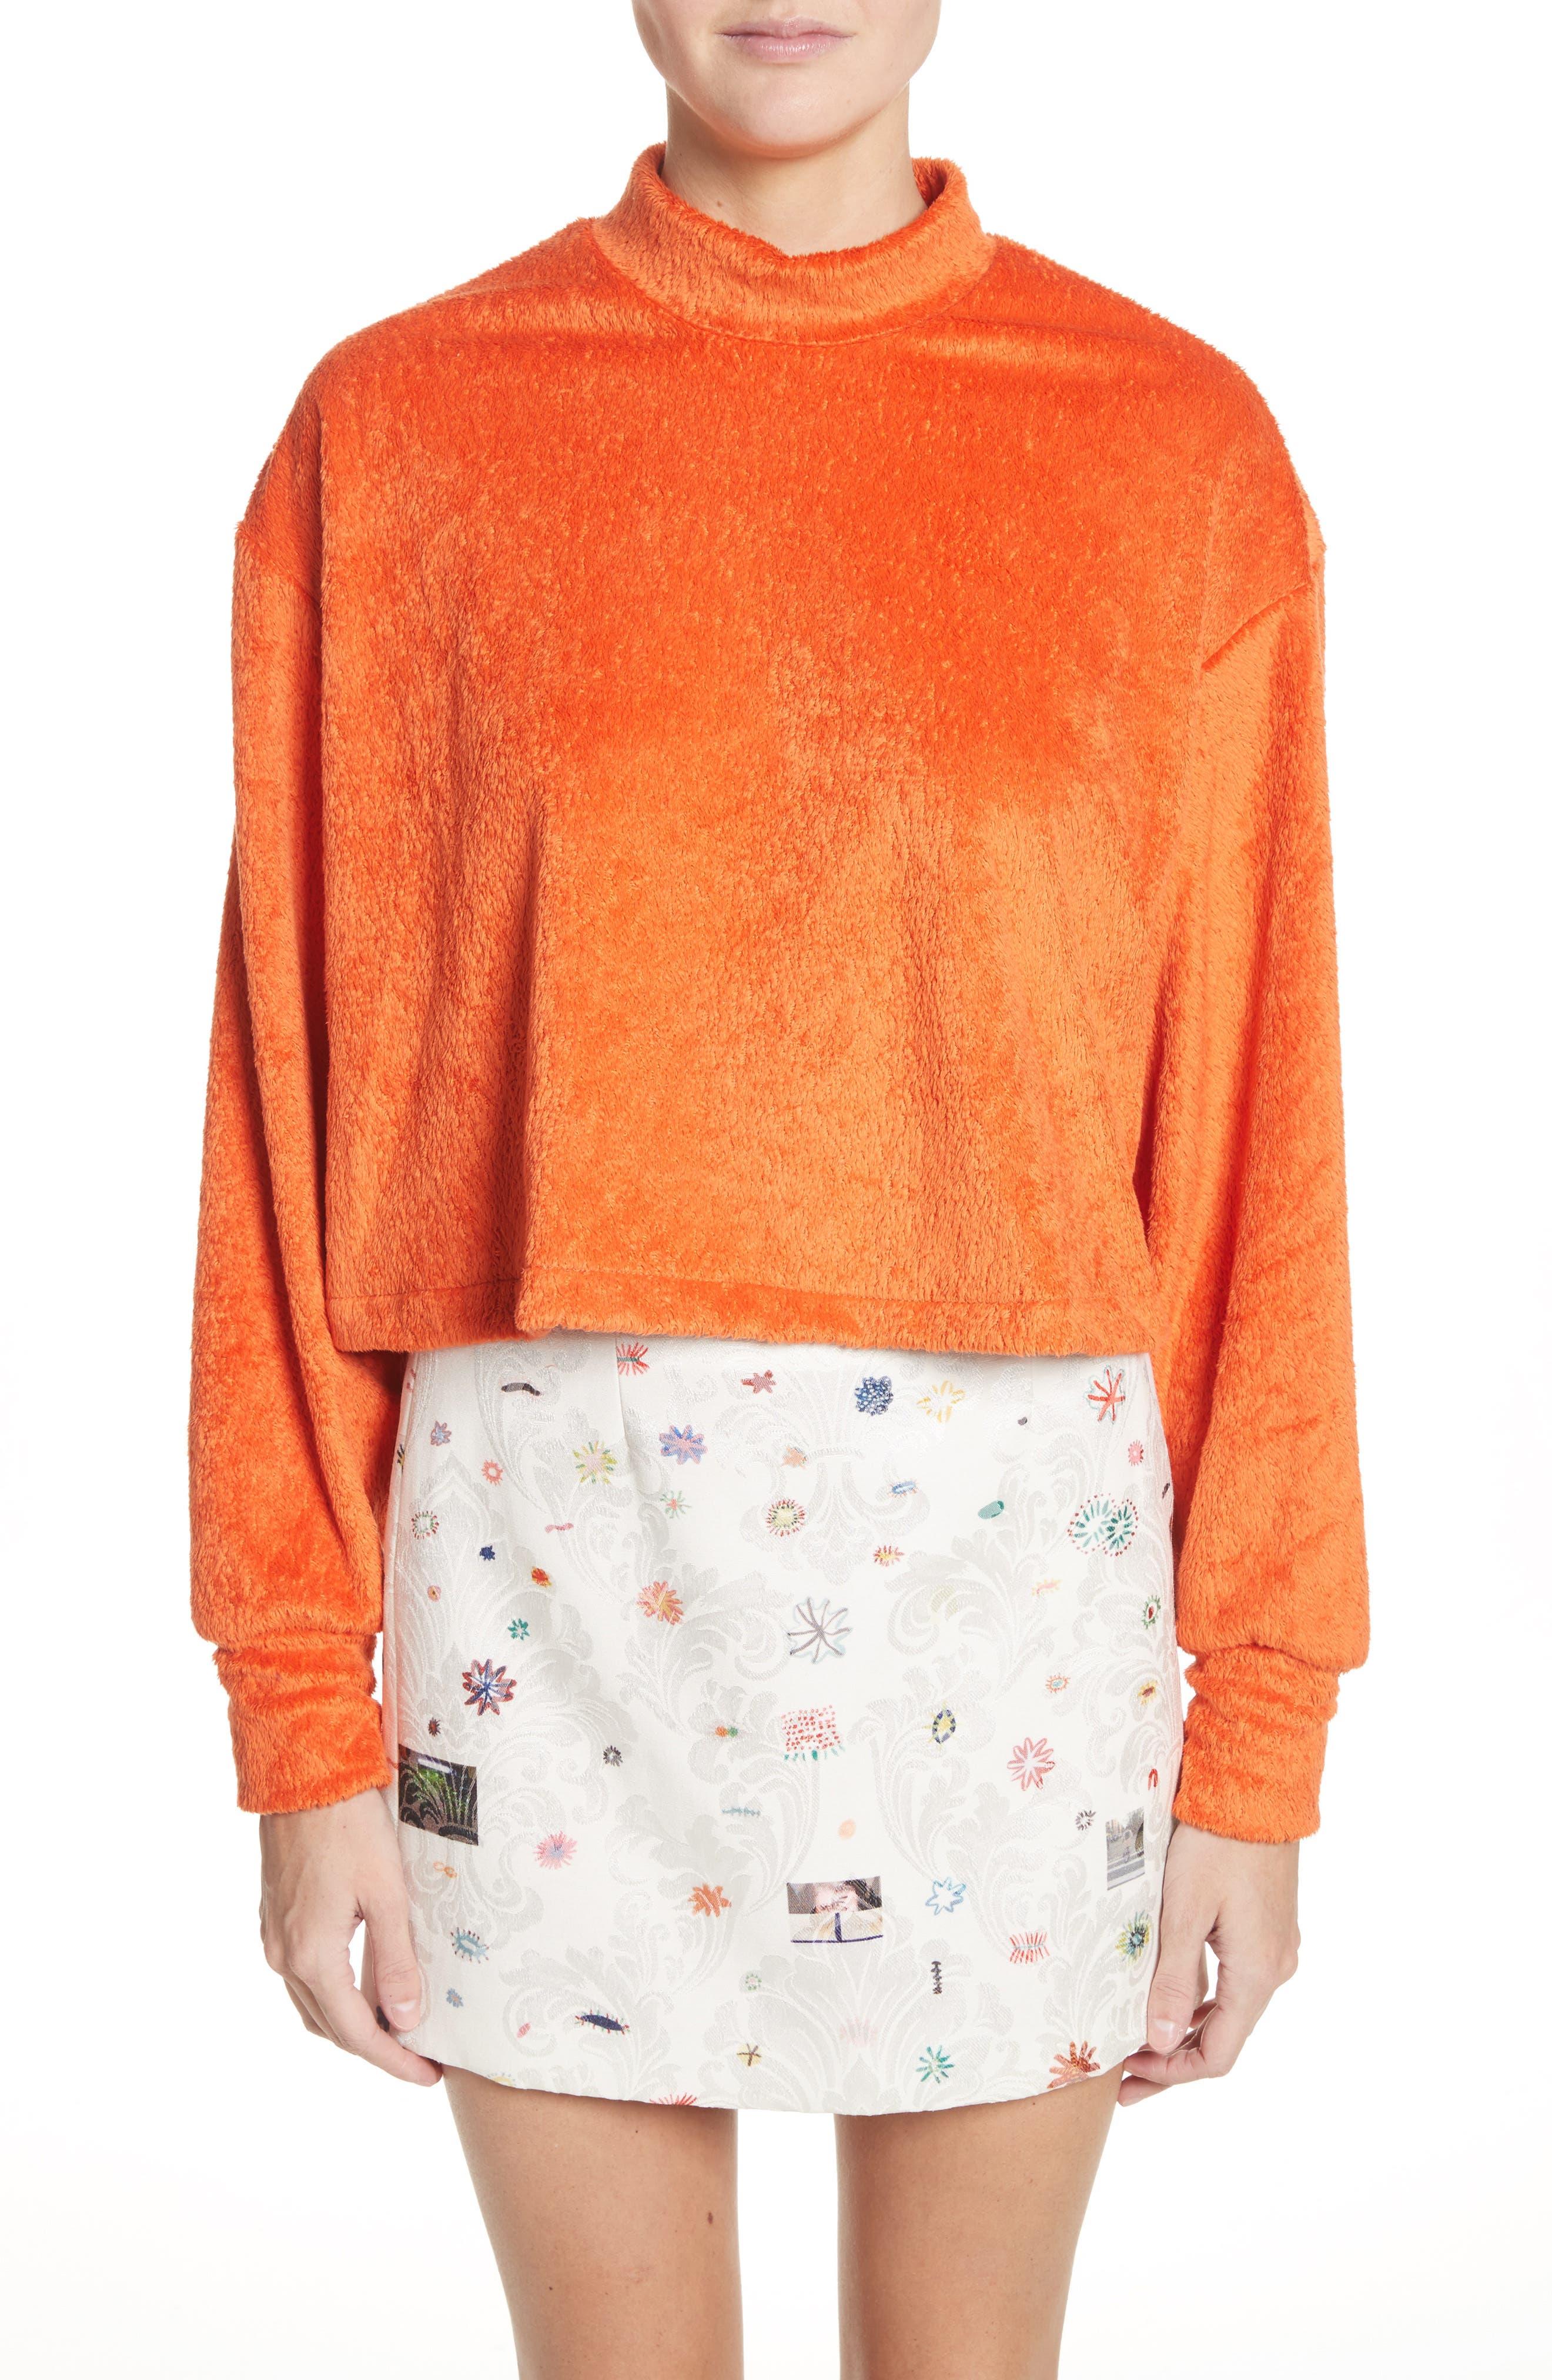 Eckhaus Latta Pillow Sweatshirt